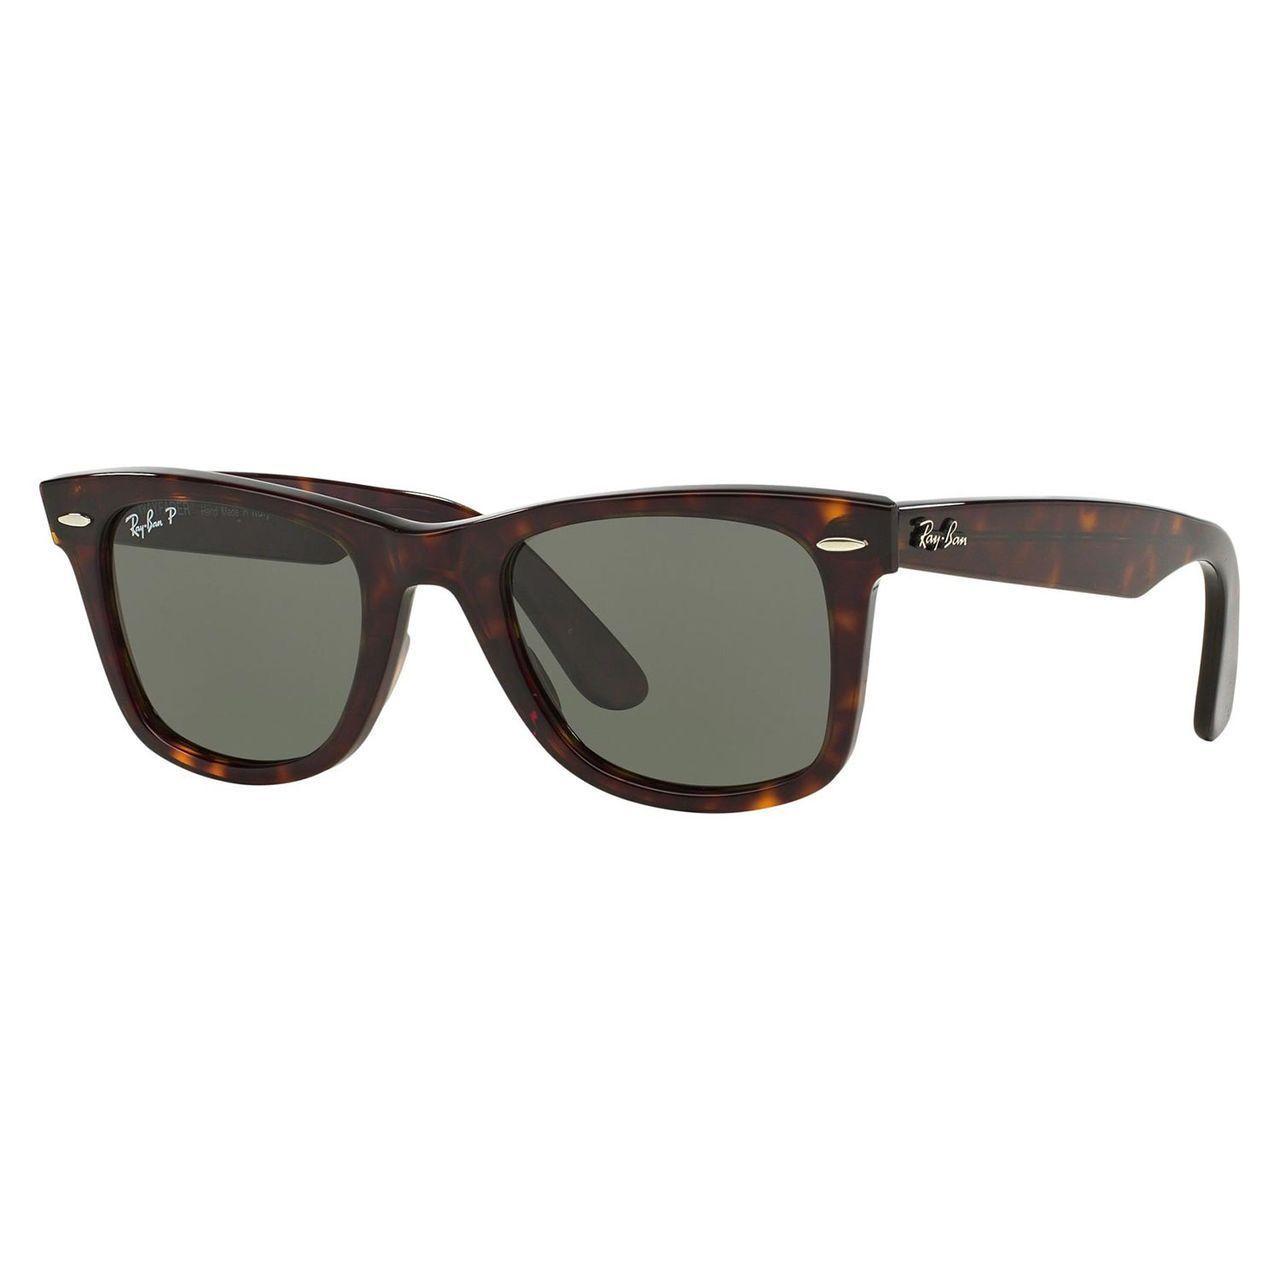 1933e45564753 Shop Ray Ban Unisex RB 2140 Original Wayfarer 902 58 Havana Plastic  Polarized 50mm Sunglasses - Free Shipping Today - Overstock - 9990464